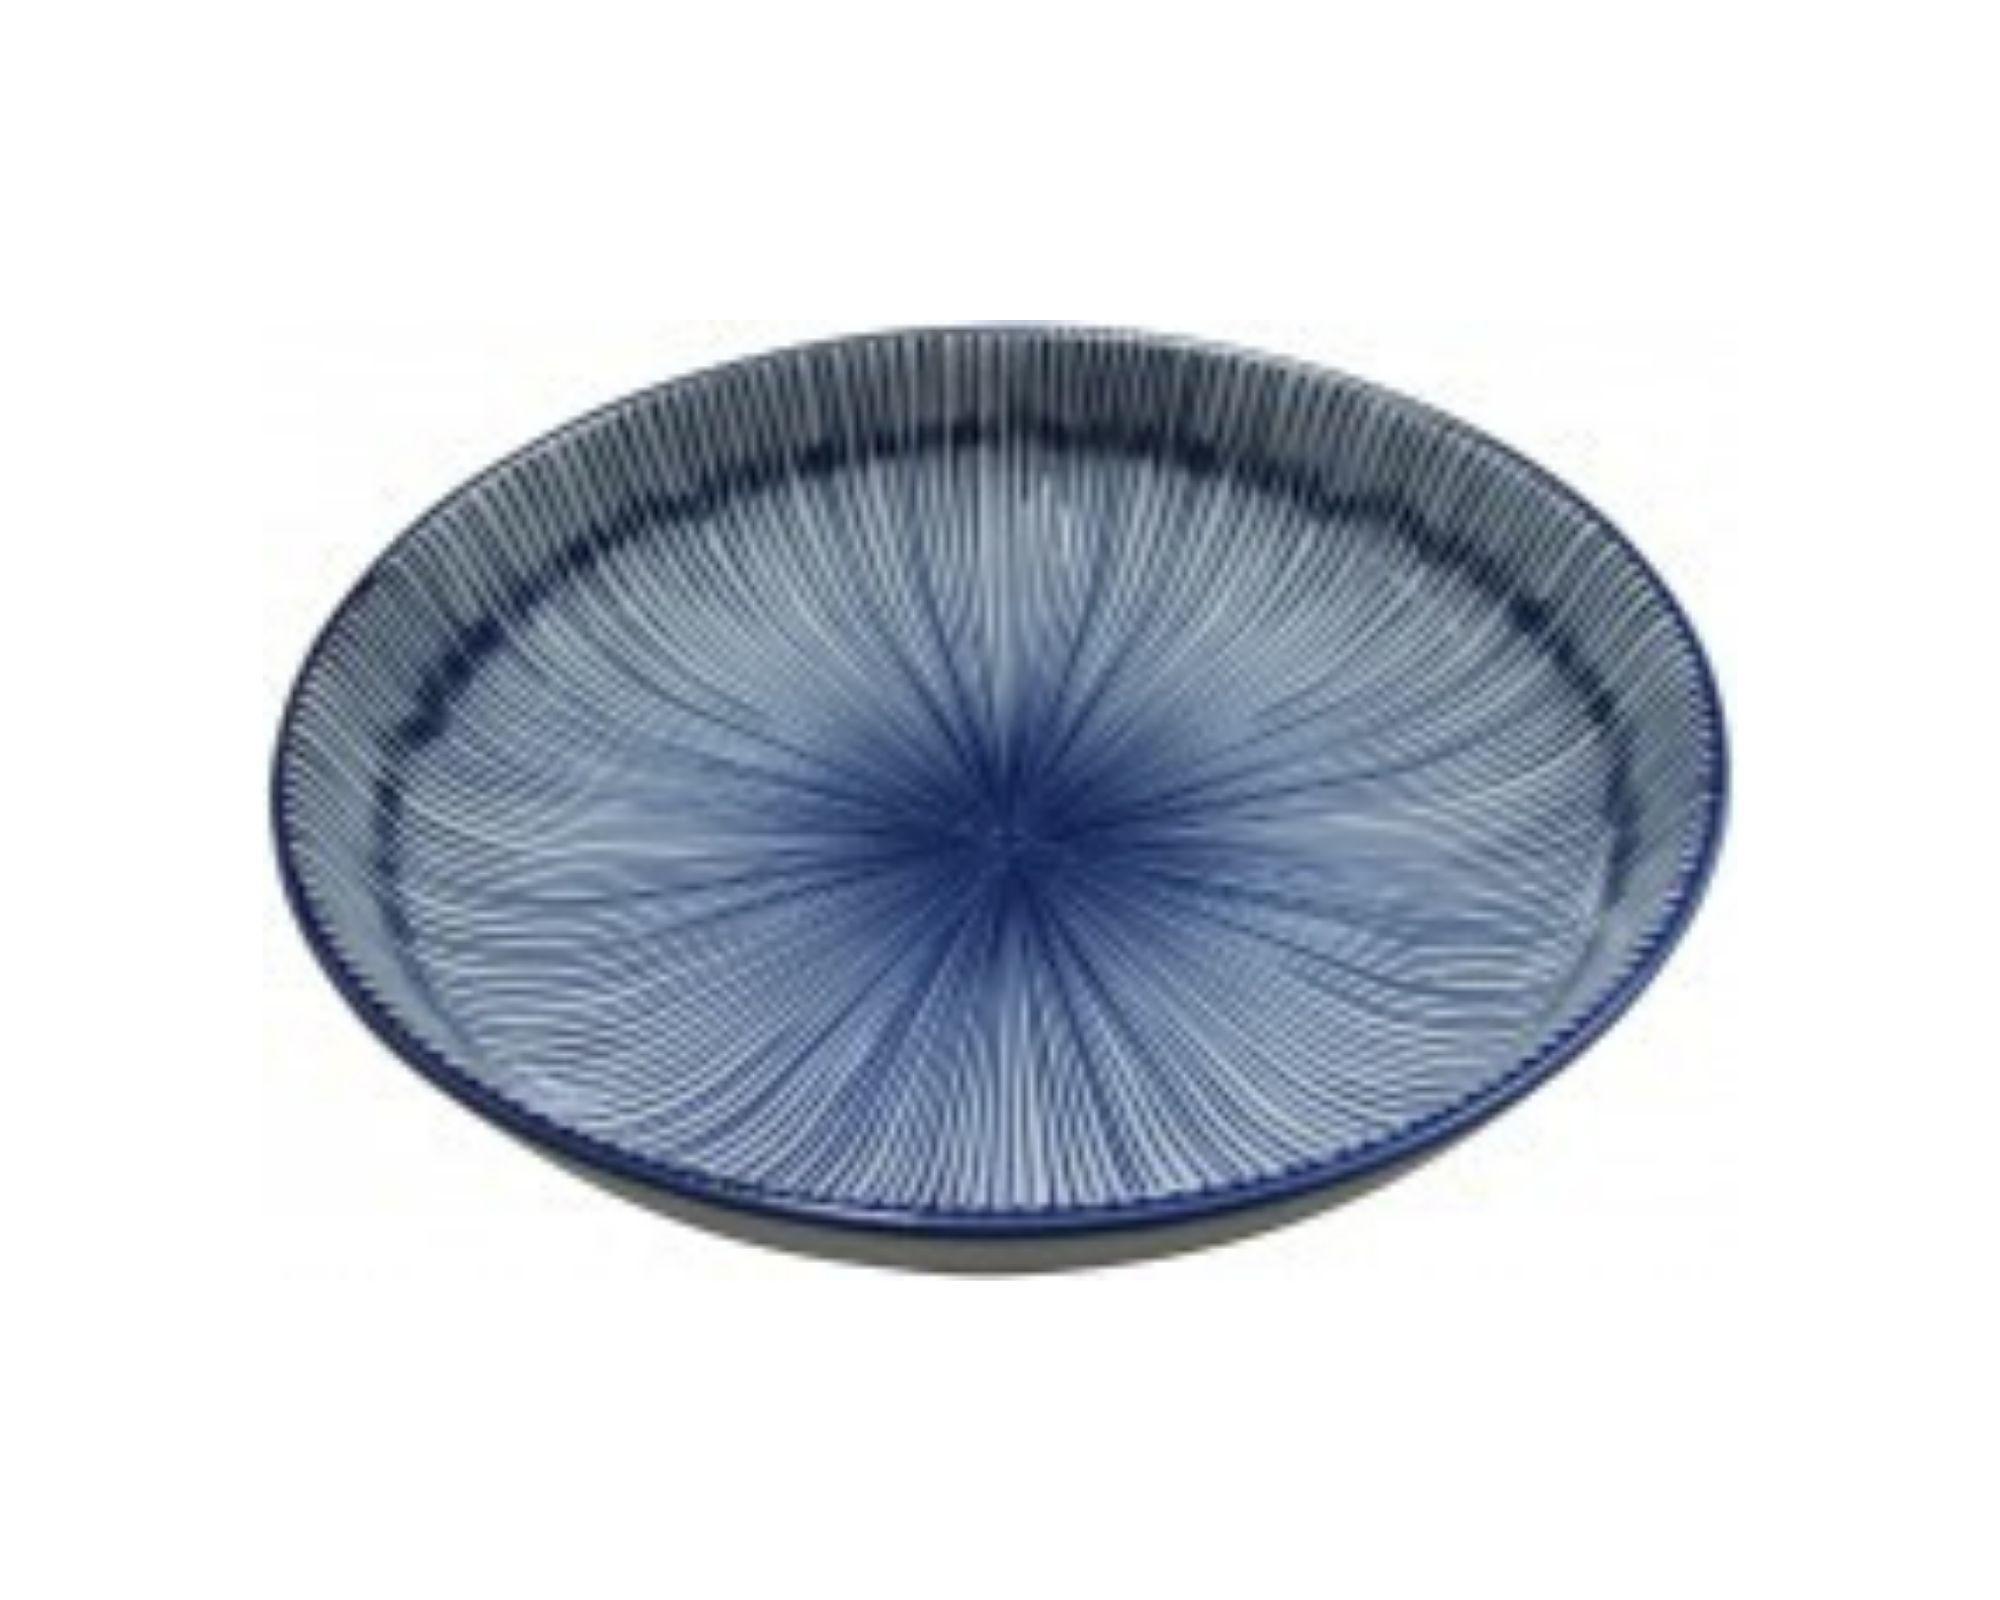 Jappa Striped Entree Plate - Splash Events, Noosa & Sunshine Coast